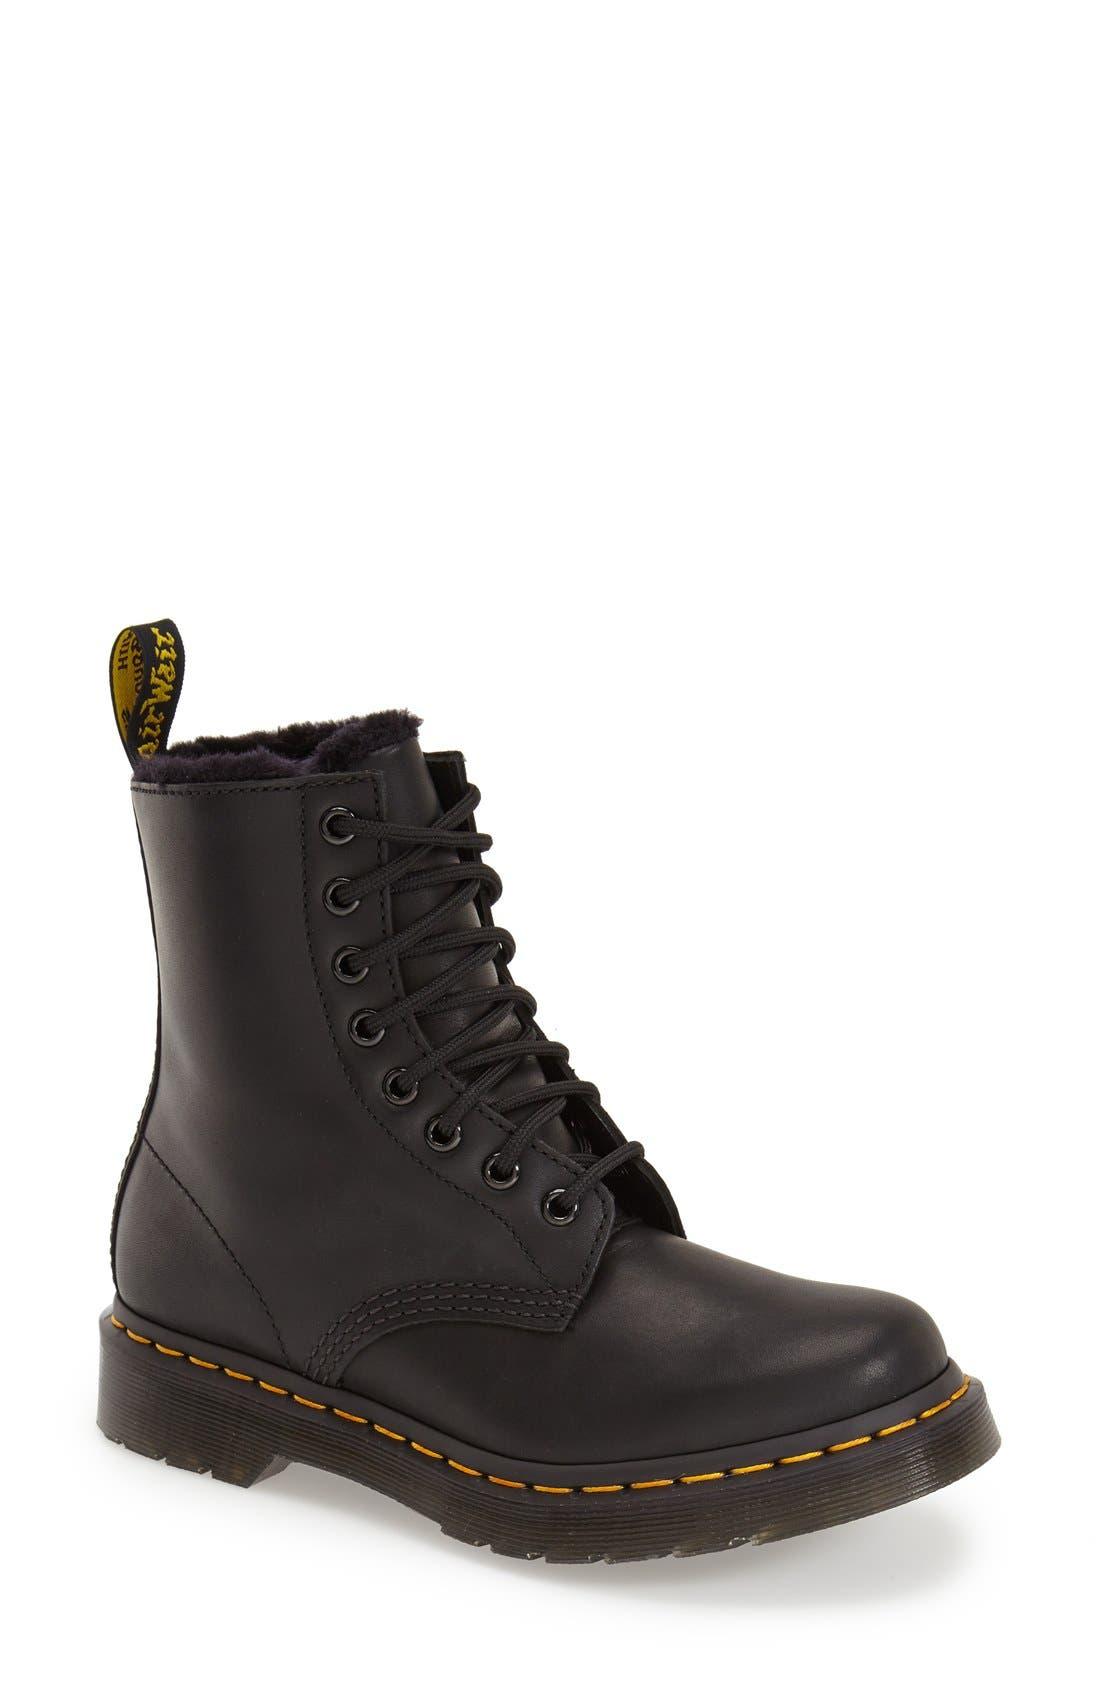 'Serena' Boot, Main, color, 002